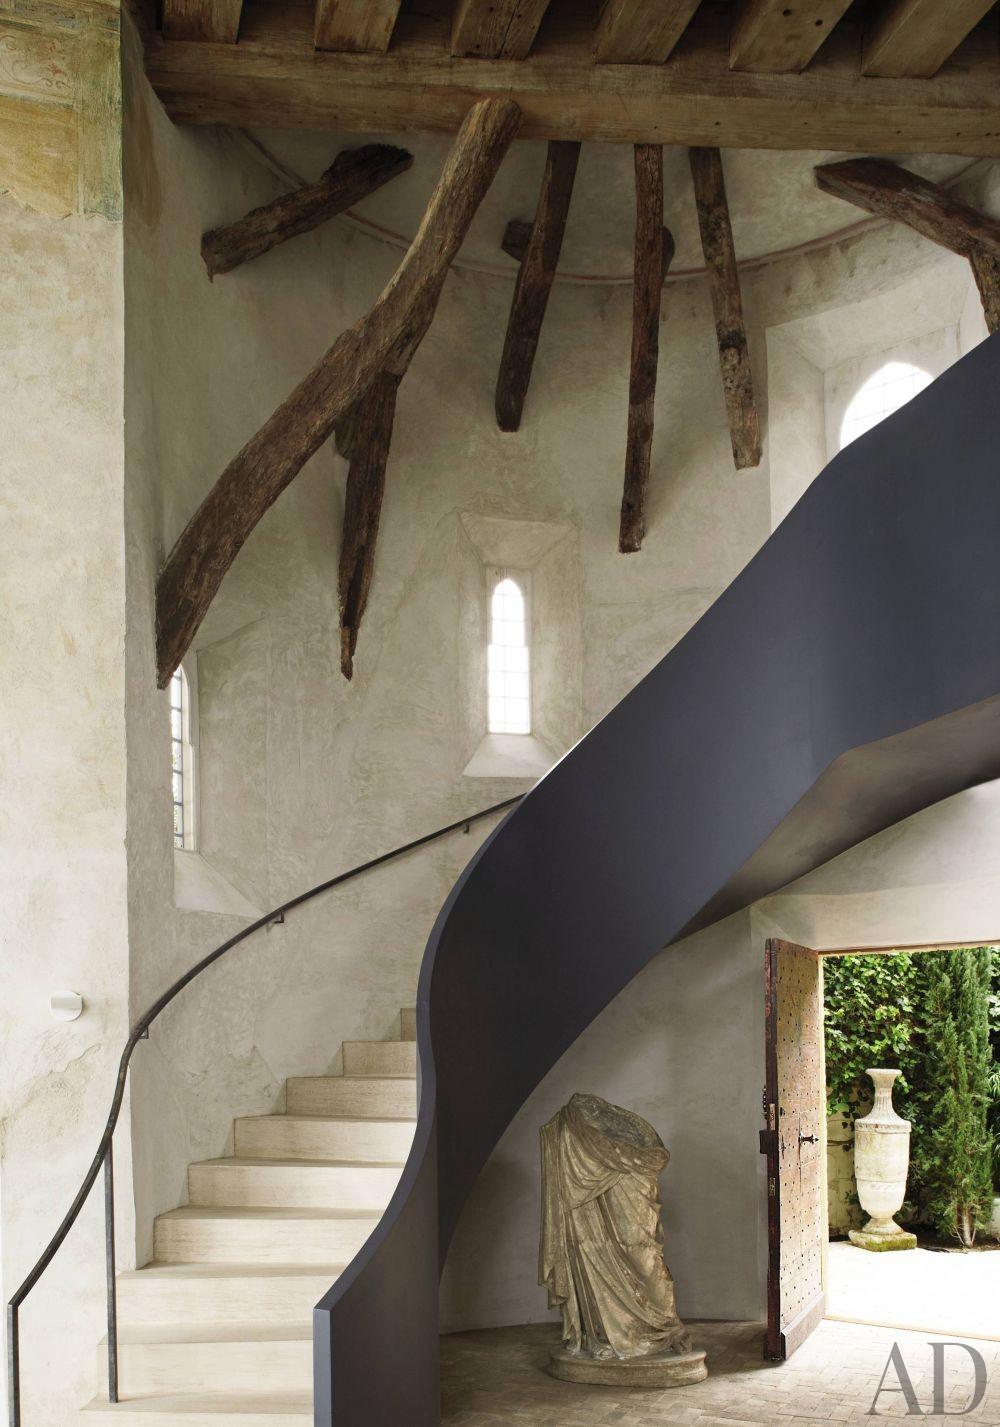 Rustic Staircase/Hallway by Richard Shapiro and Douglas W. Burdge in Malibu, CA